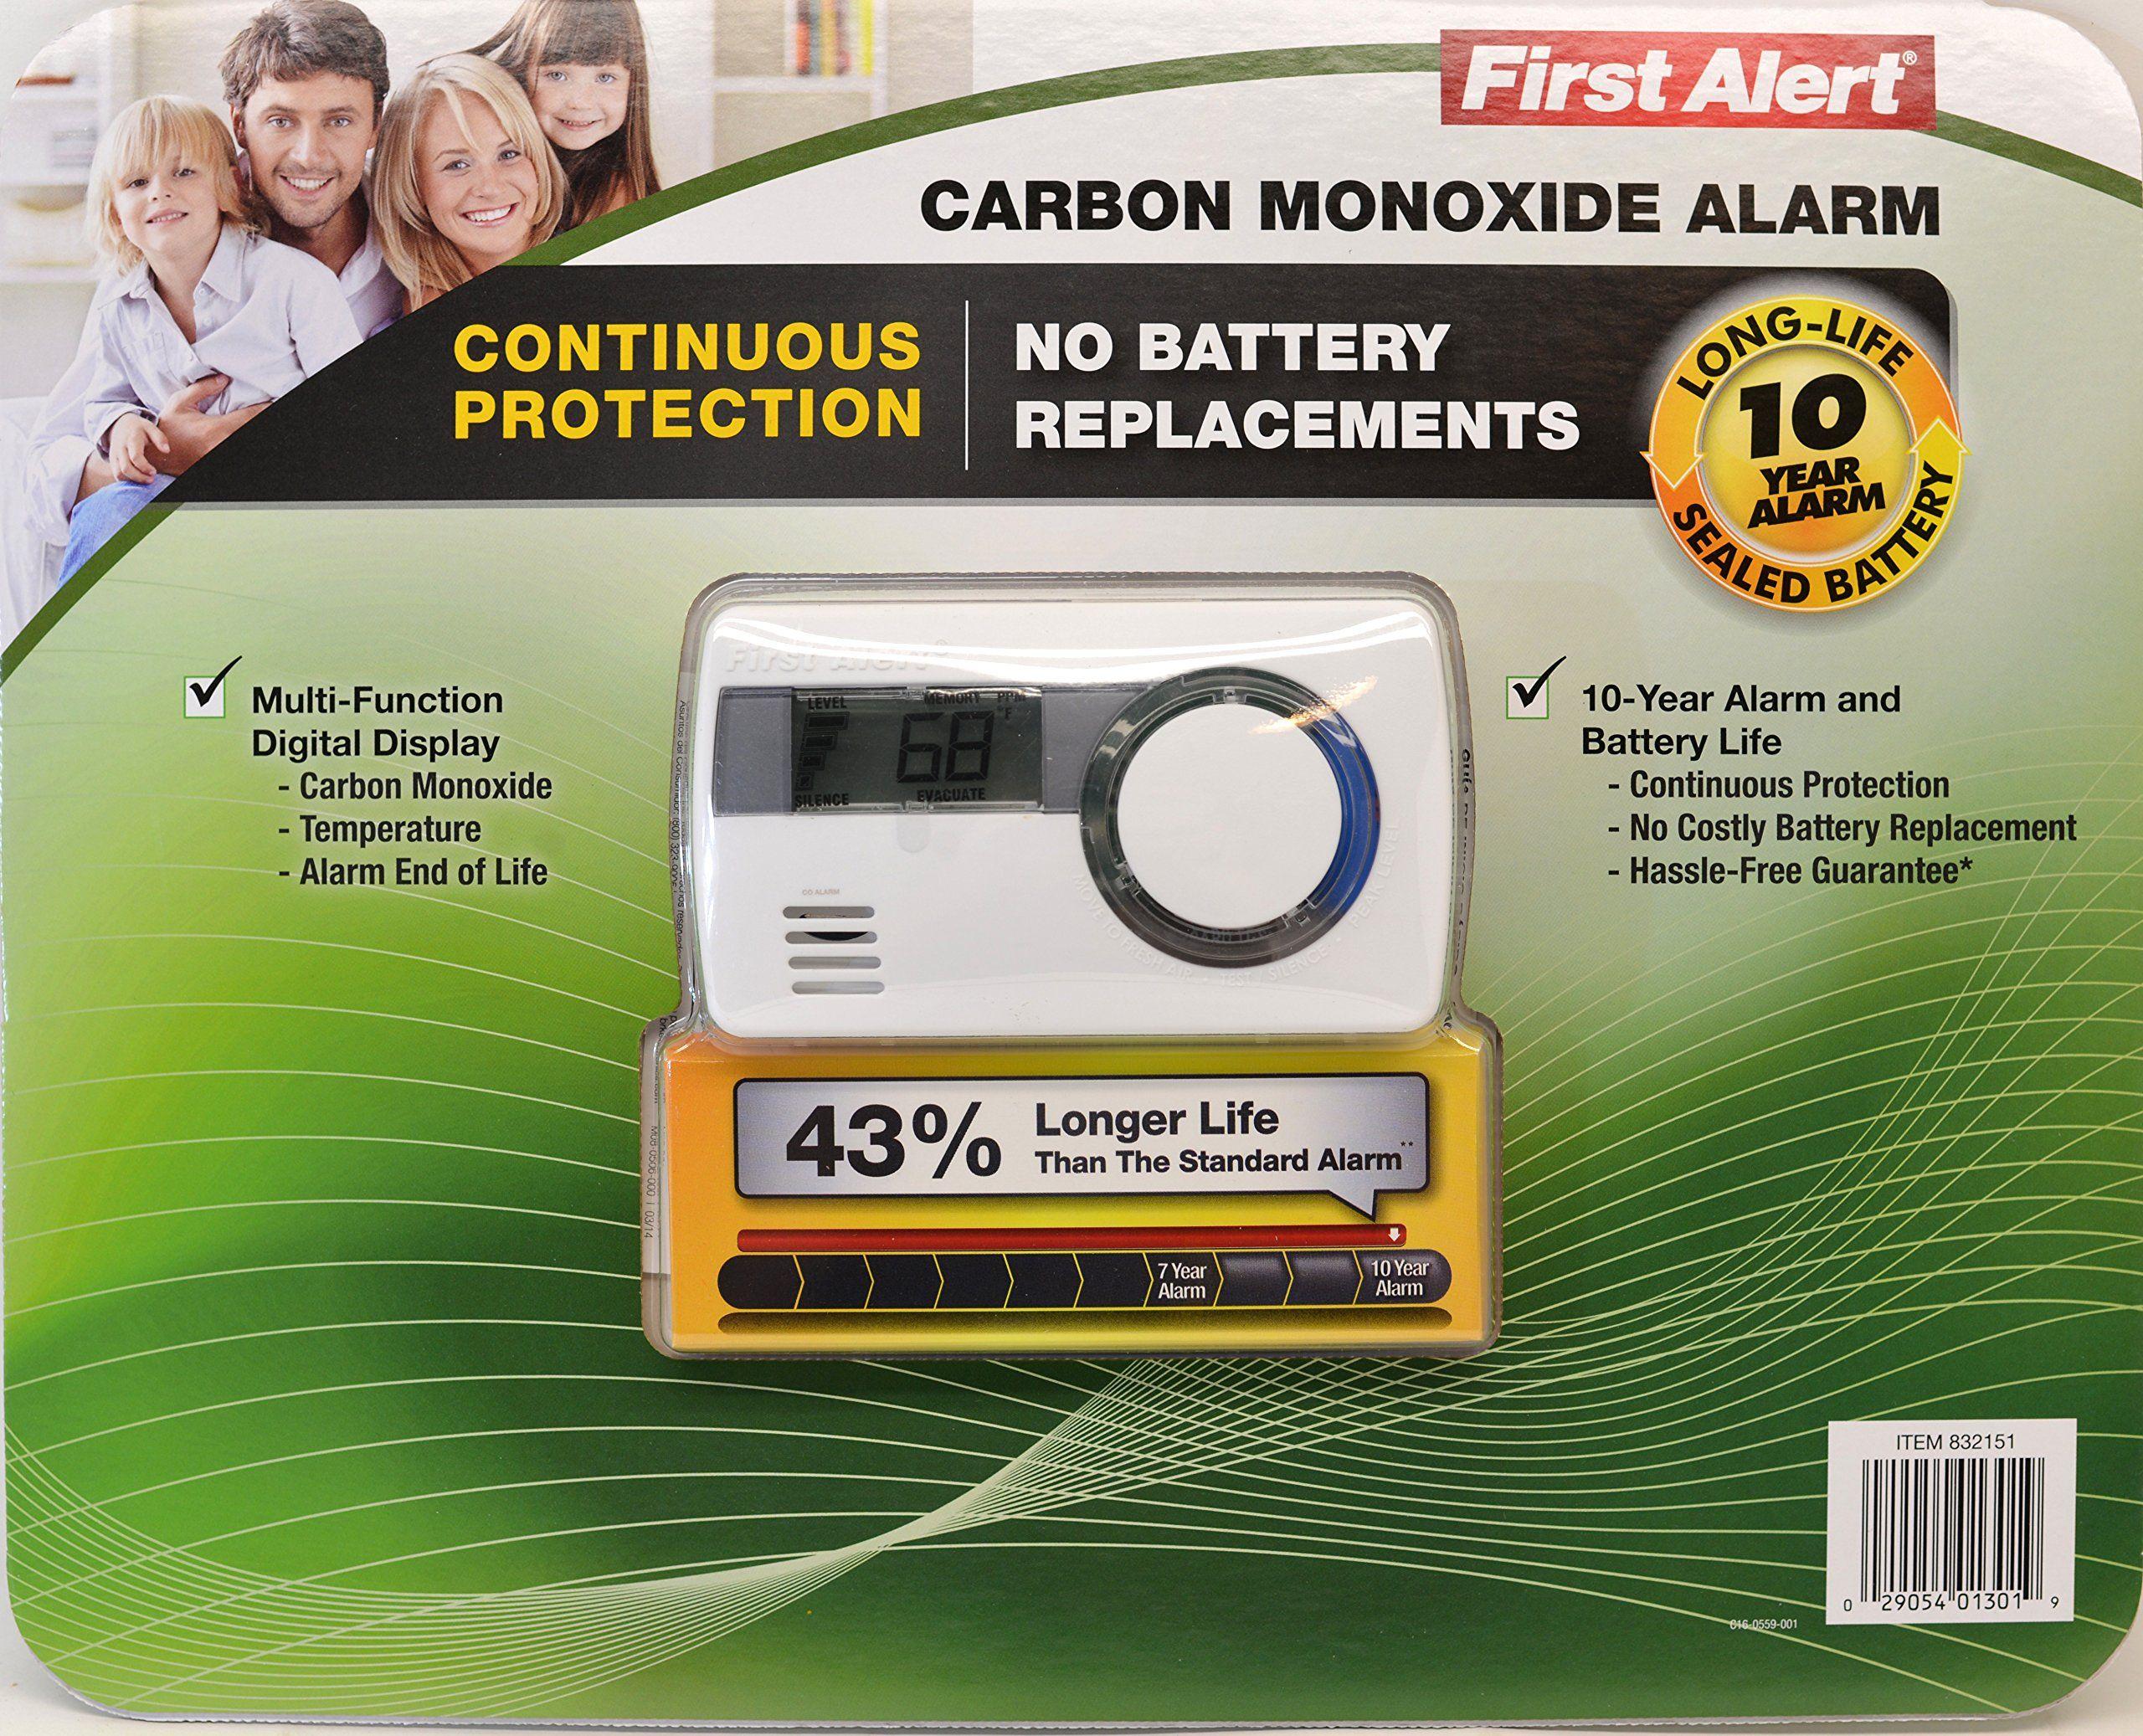 First Alert Carbon Monoxide Alar Long life 10 Year Alarm